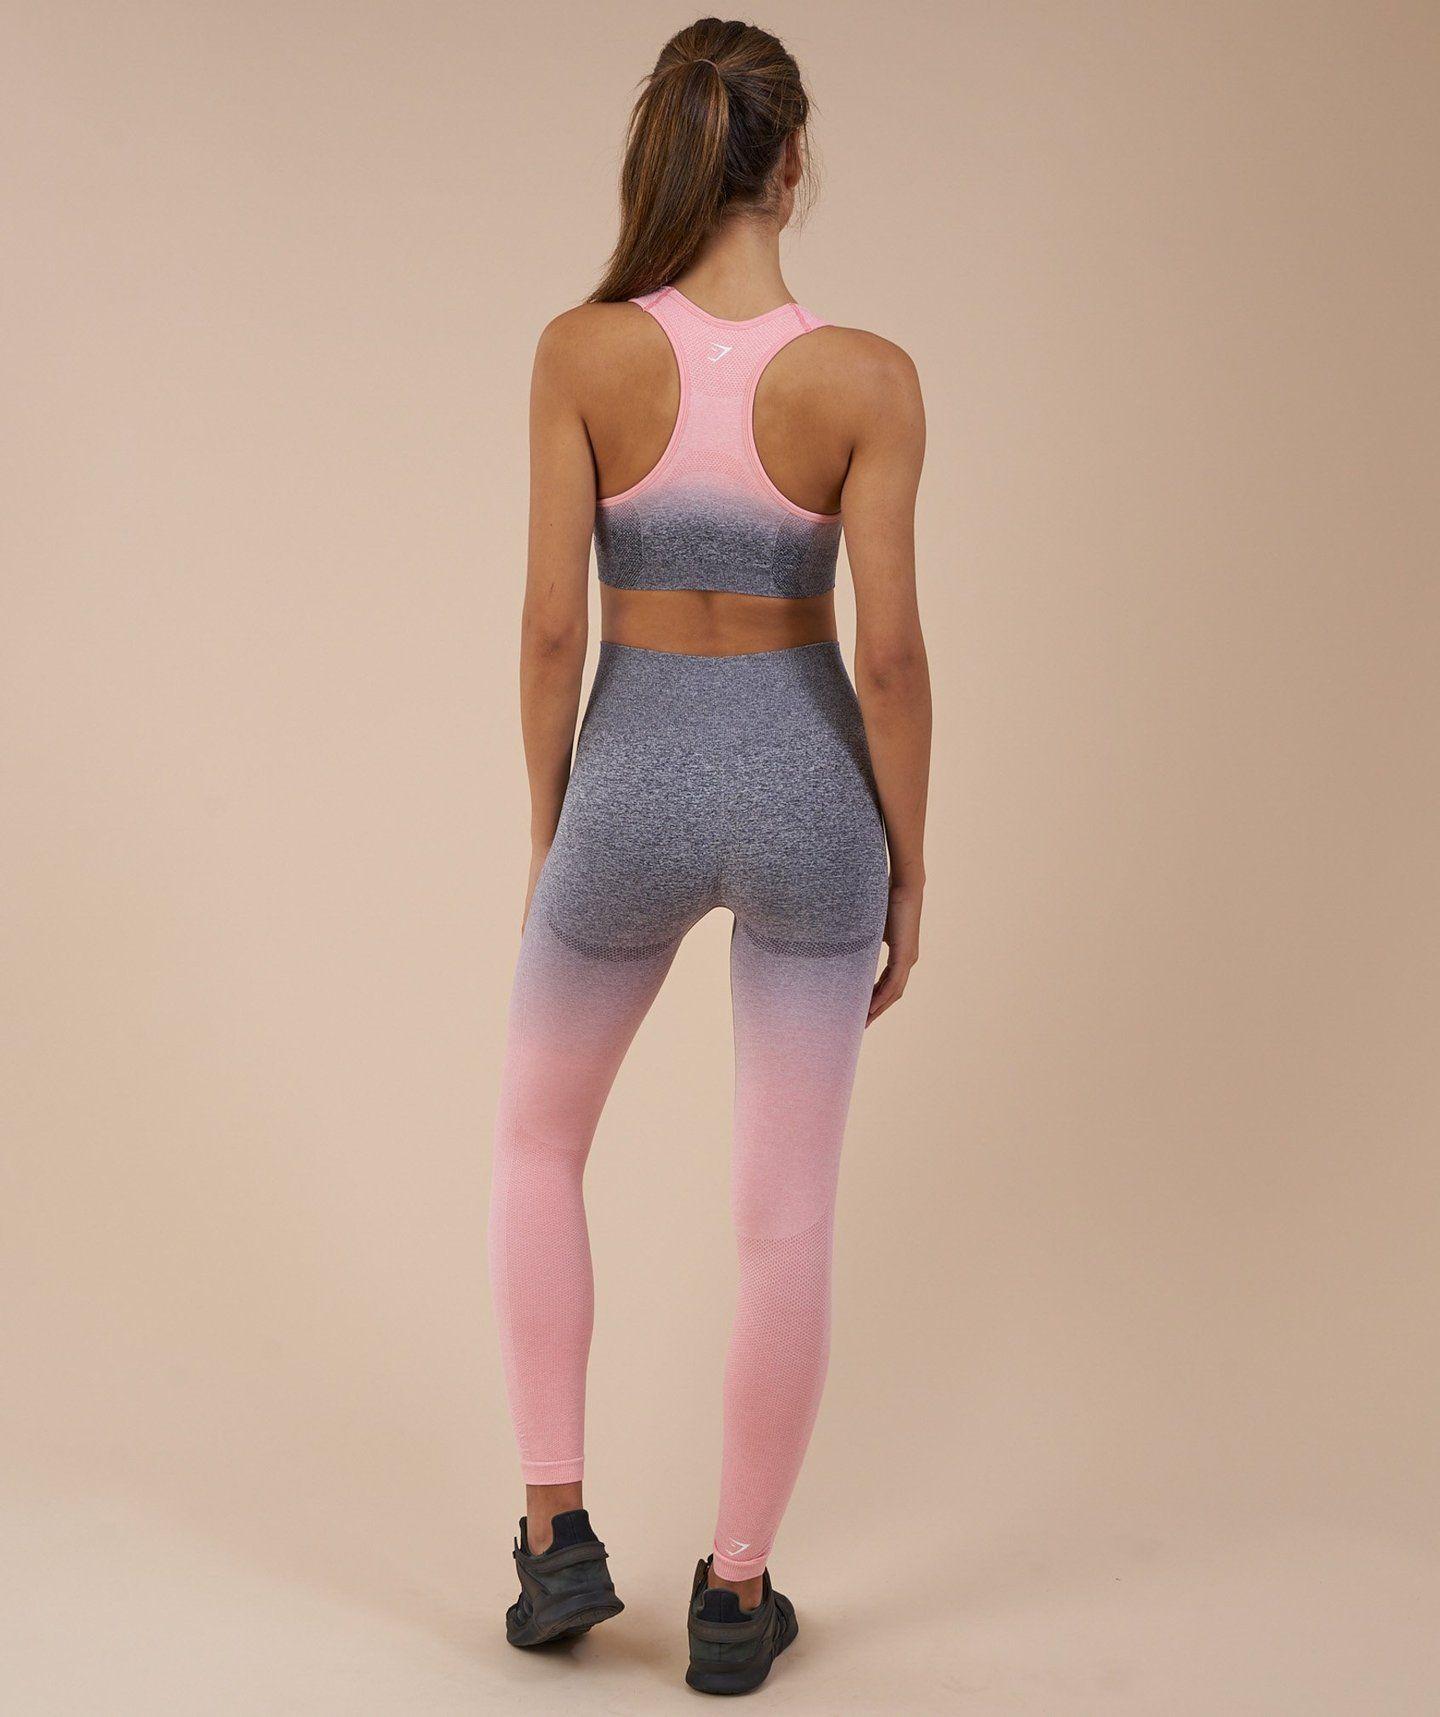 e9dda3b58b741e Gymshark Ombre Seamless Leggings - Peach Pink/Charcoal 1 | Fashion ...